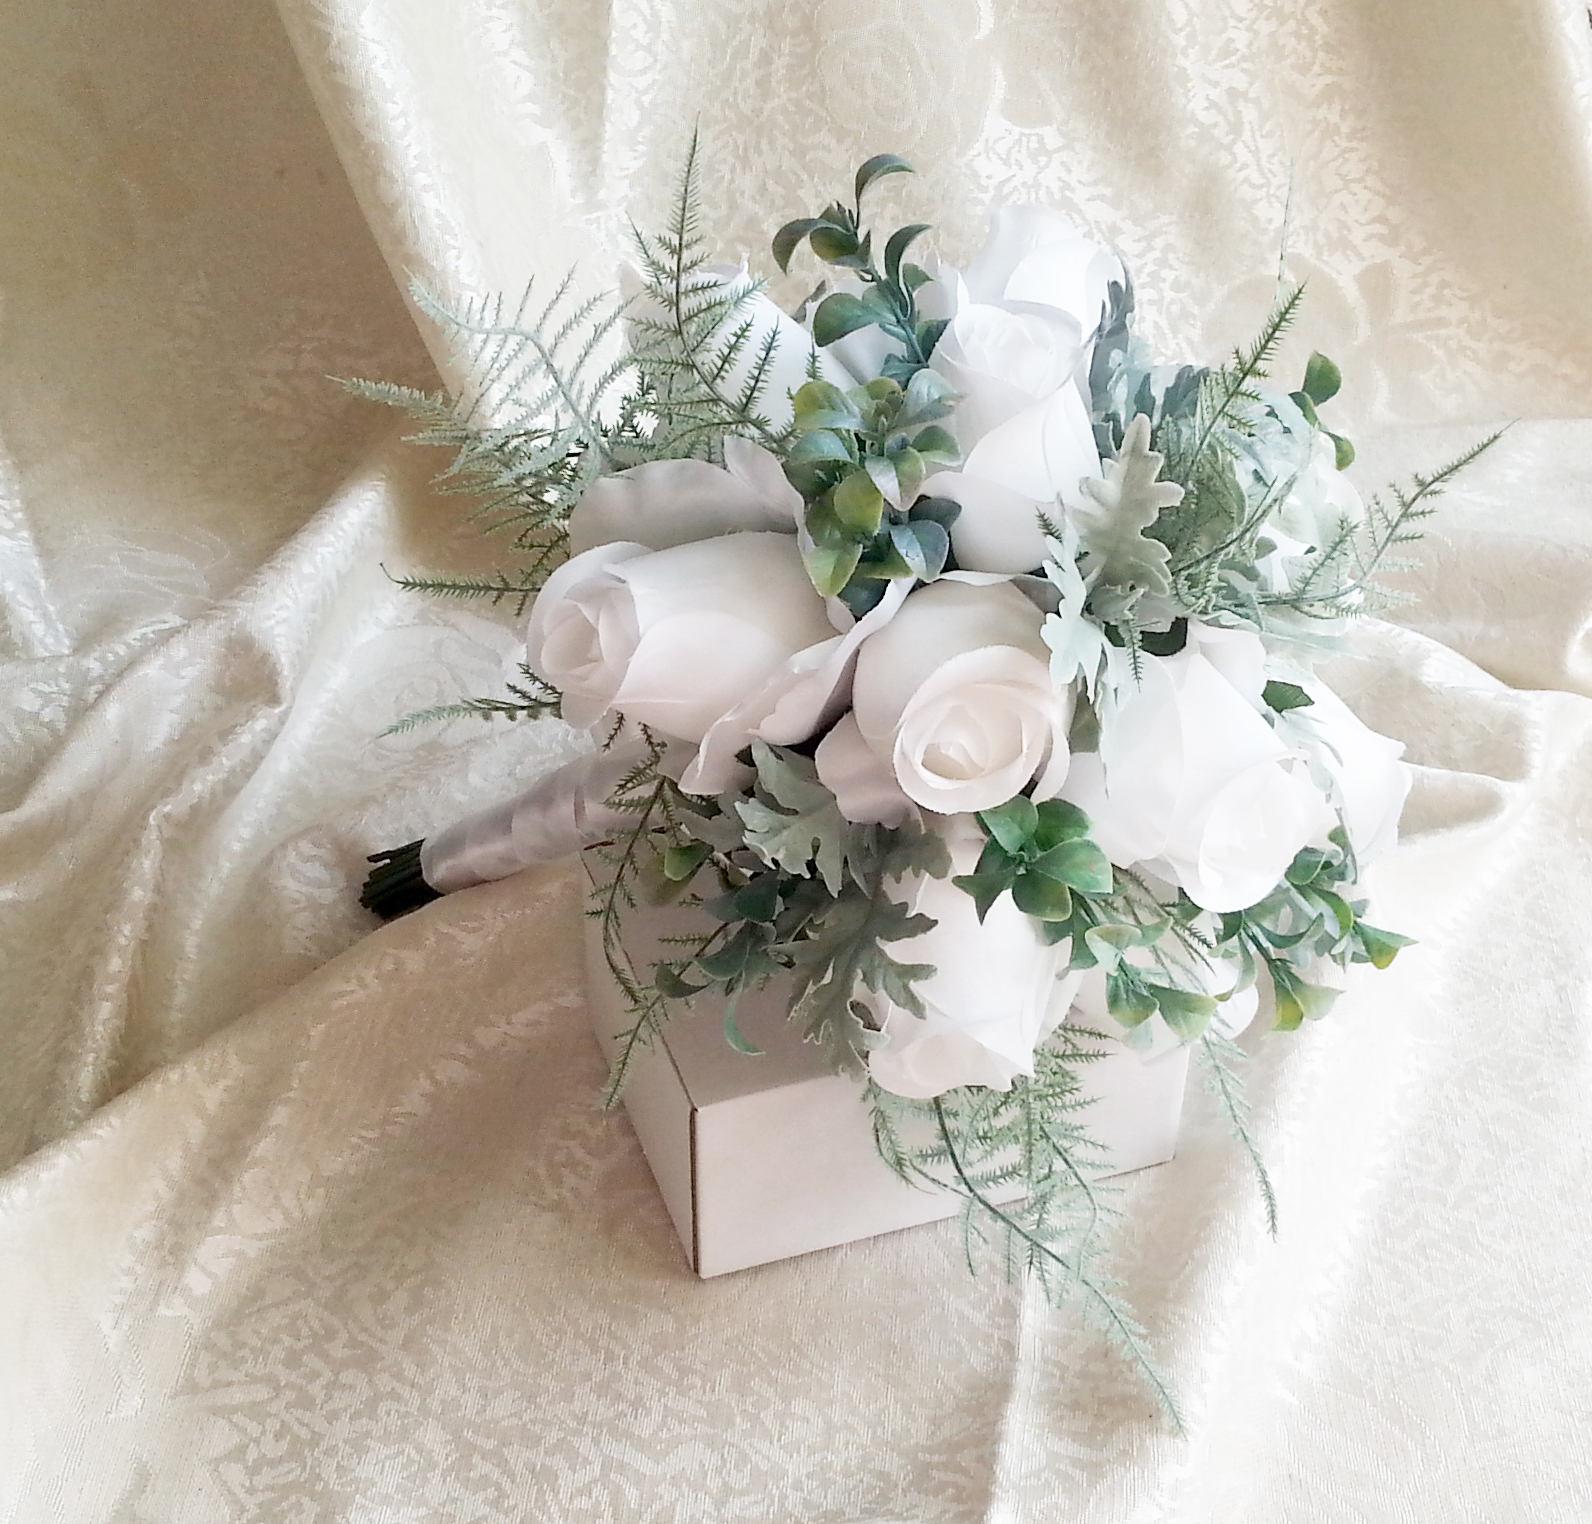 White roses dusty miller wedding bouquet frosted greenery fern white roses dusty miller wedding bouquet frosted greenery fern scotch scotishc silk fabric flowers wedding satin ribbon stem greenery bride izmirmasajfo